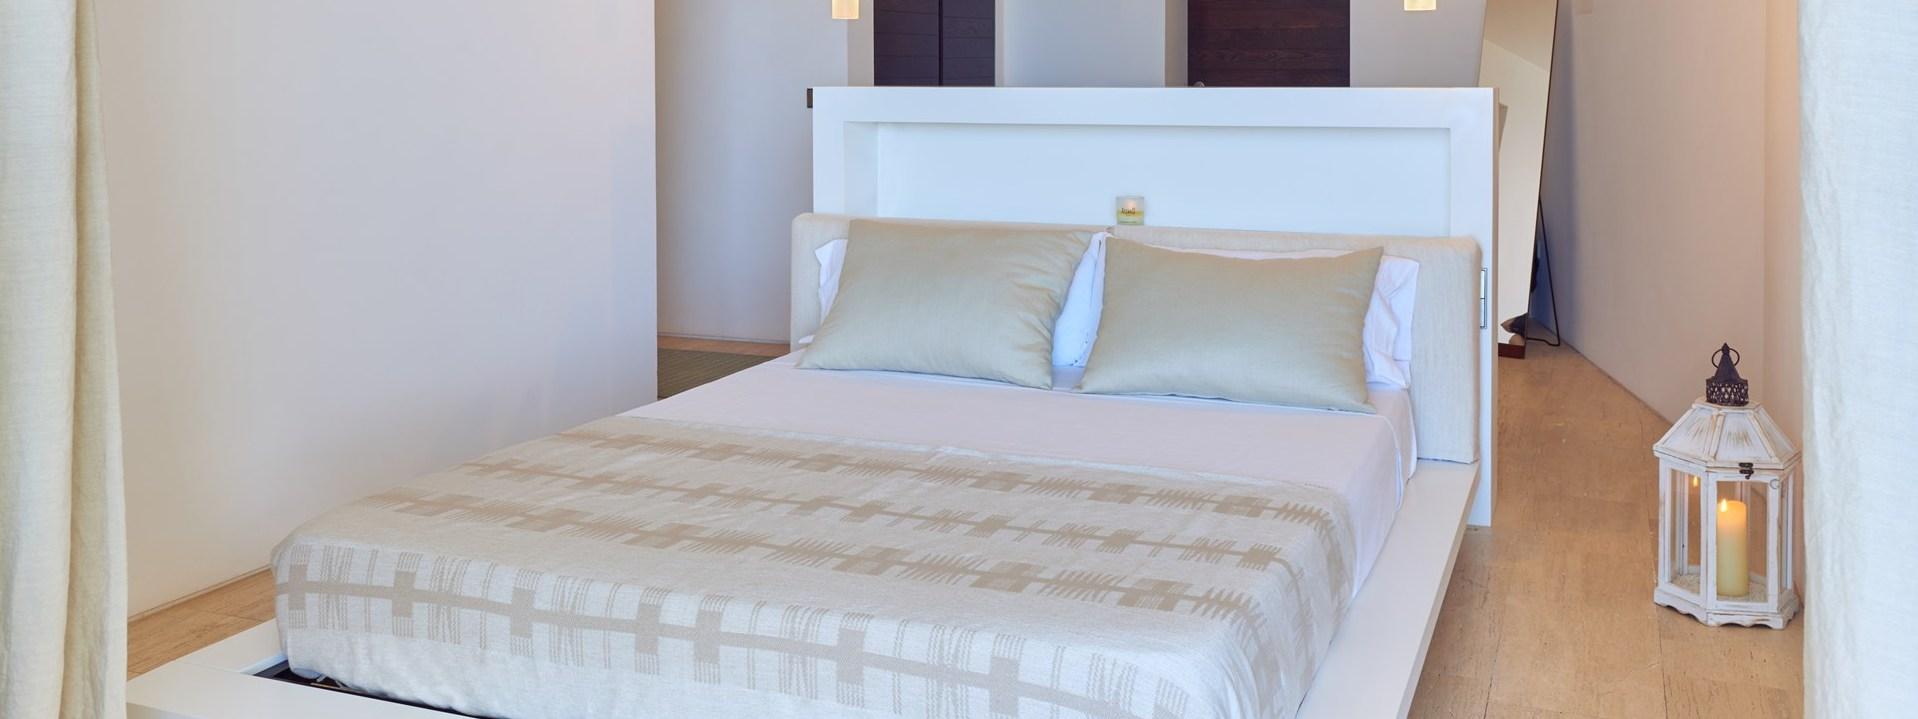 villa-can-castello-double-bedroom2